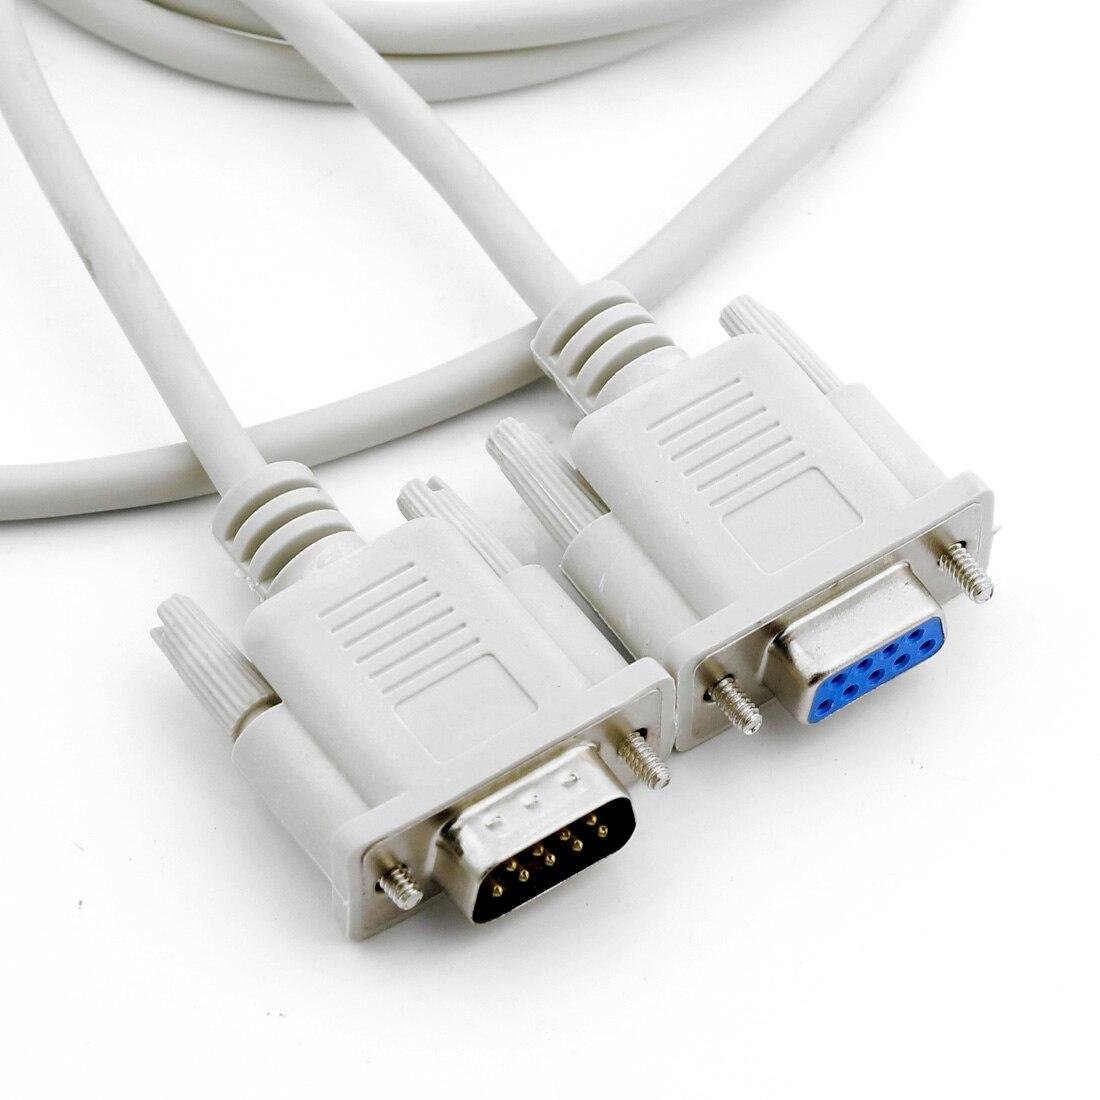 Kabel Serial DB9 (RS232) Female to Female 1.5M / 1.5 M / 1.5 METER